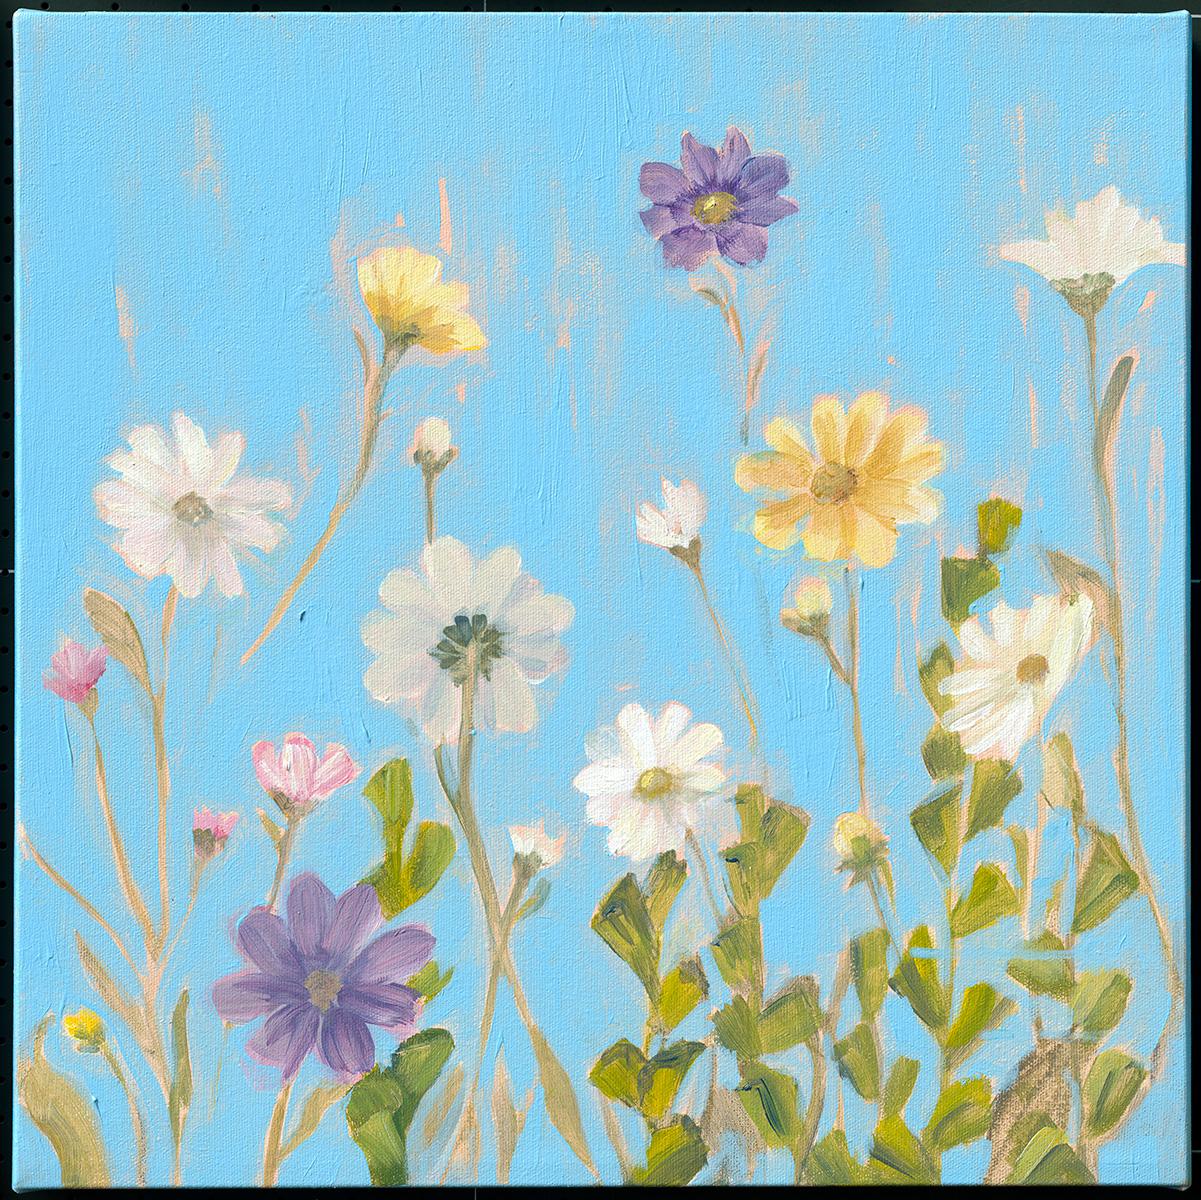 Wildflowers-3-by-Sandra-Iafrate